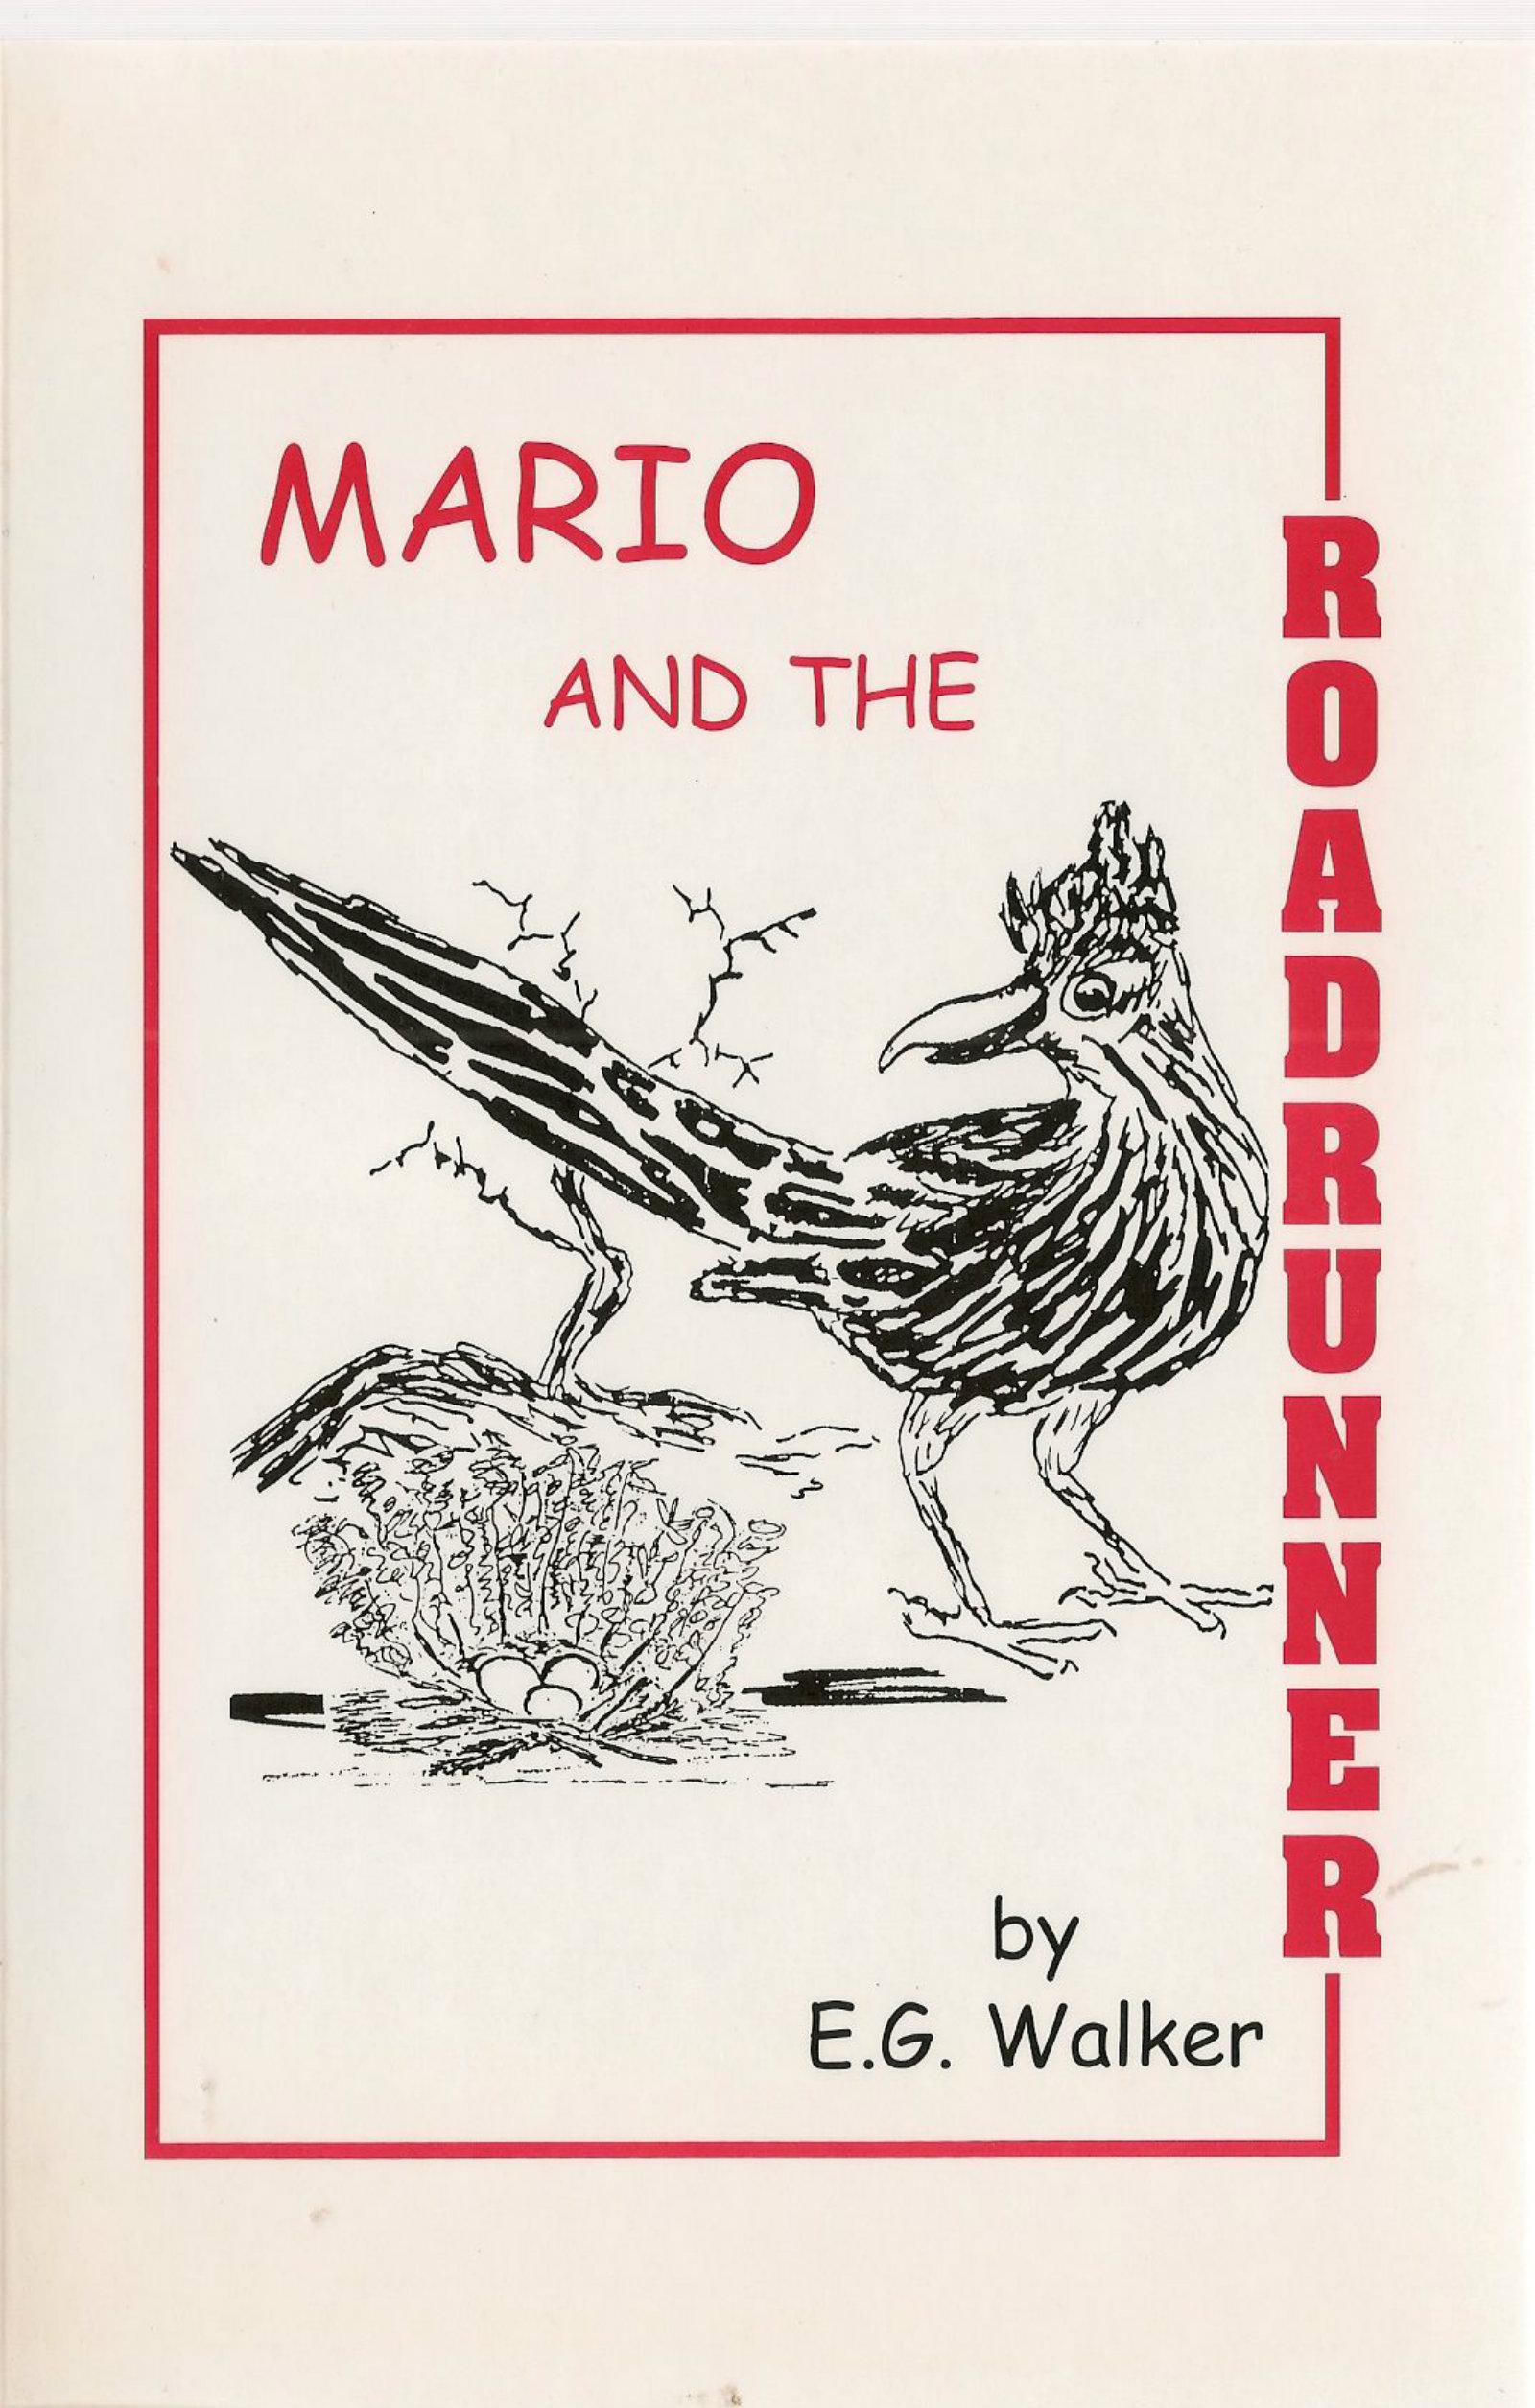 MARIO AND THE MEERKAT (MARIO SERIES FOR CHILDREN Book 1)